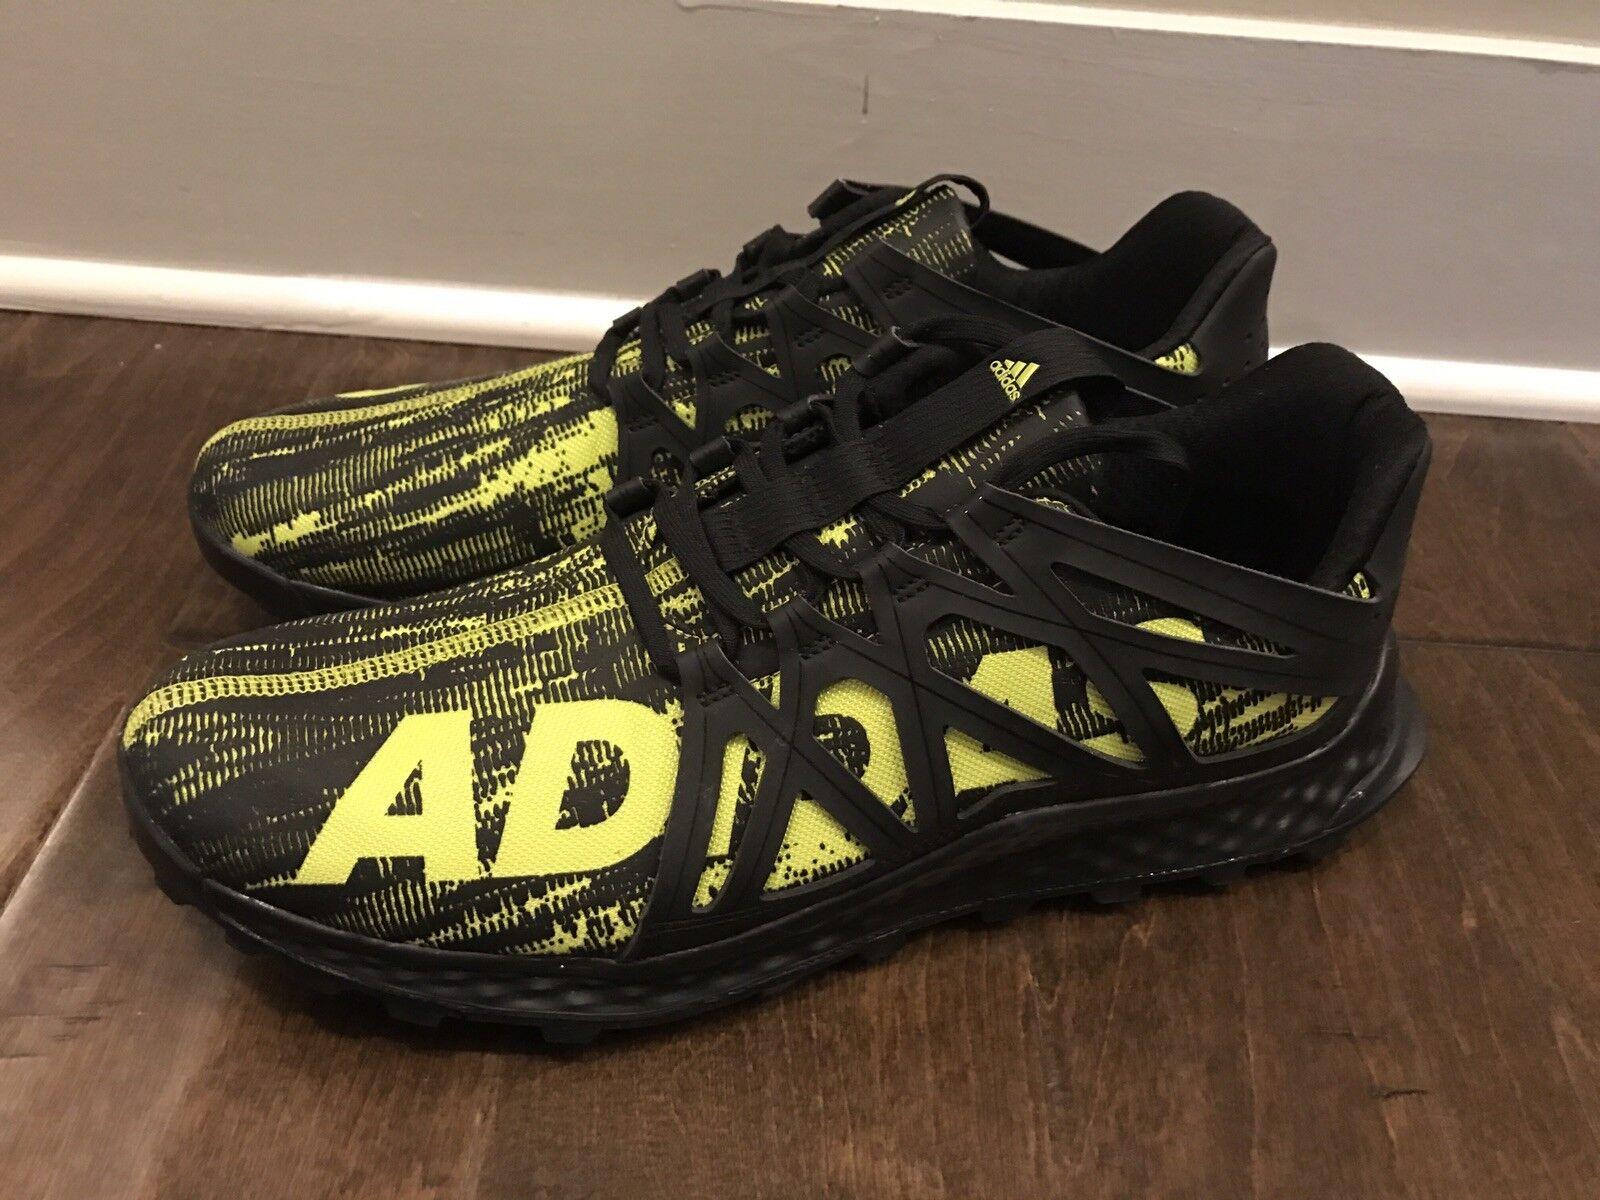 Adidas Men's Size 13 Vigor Bounce Trail shoes BB8380 Black Yellow - New